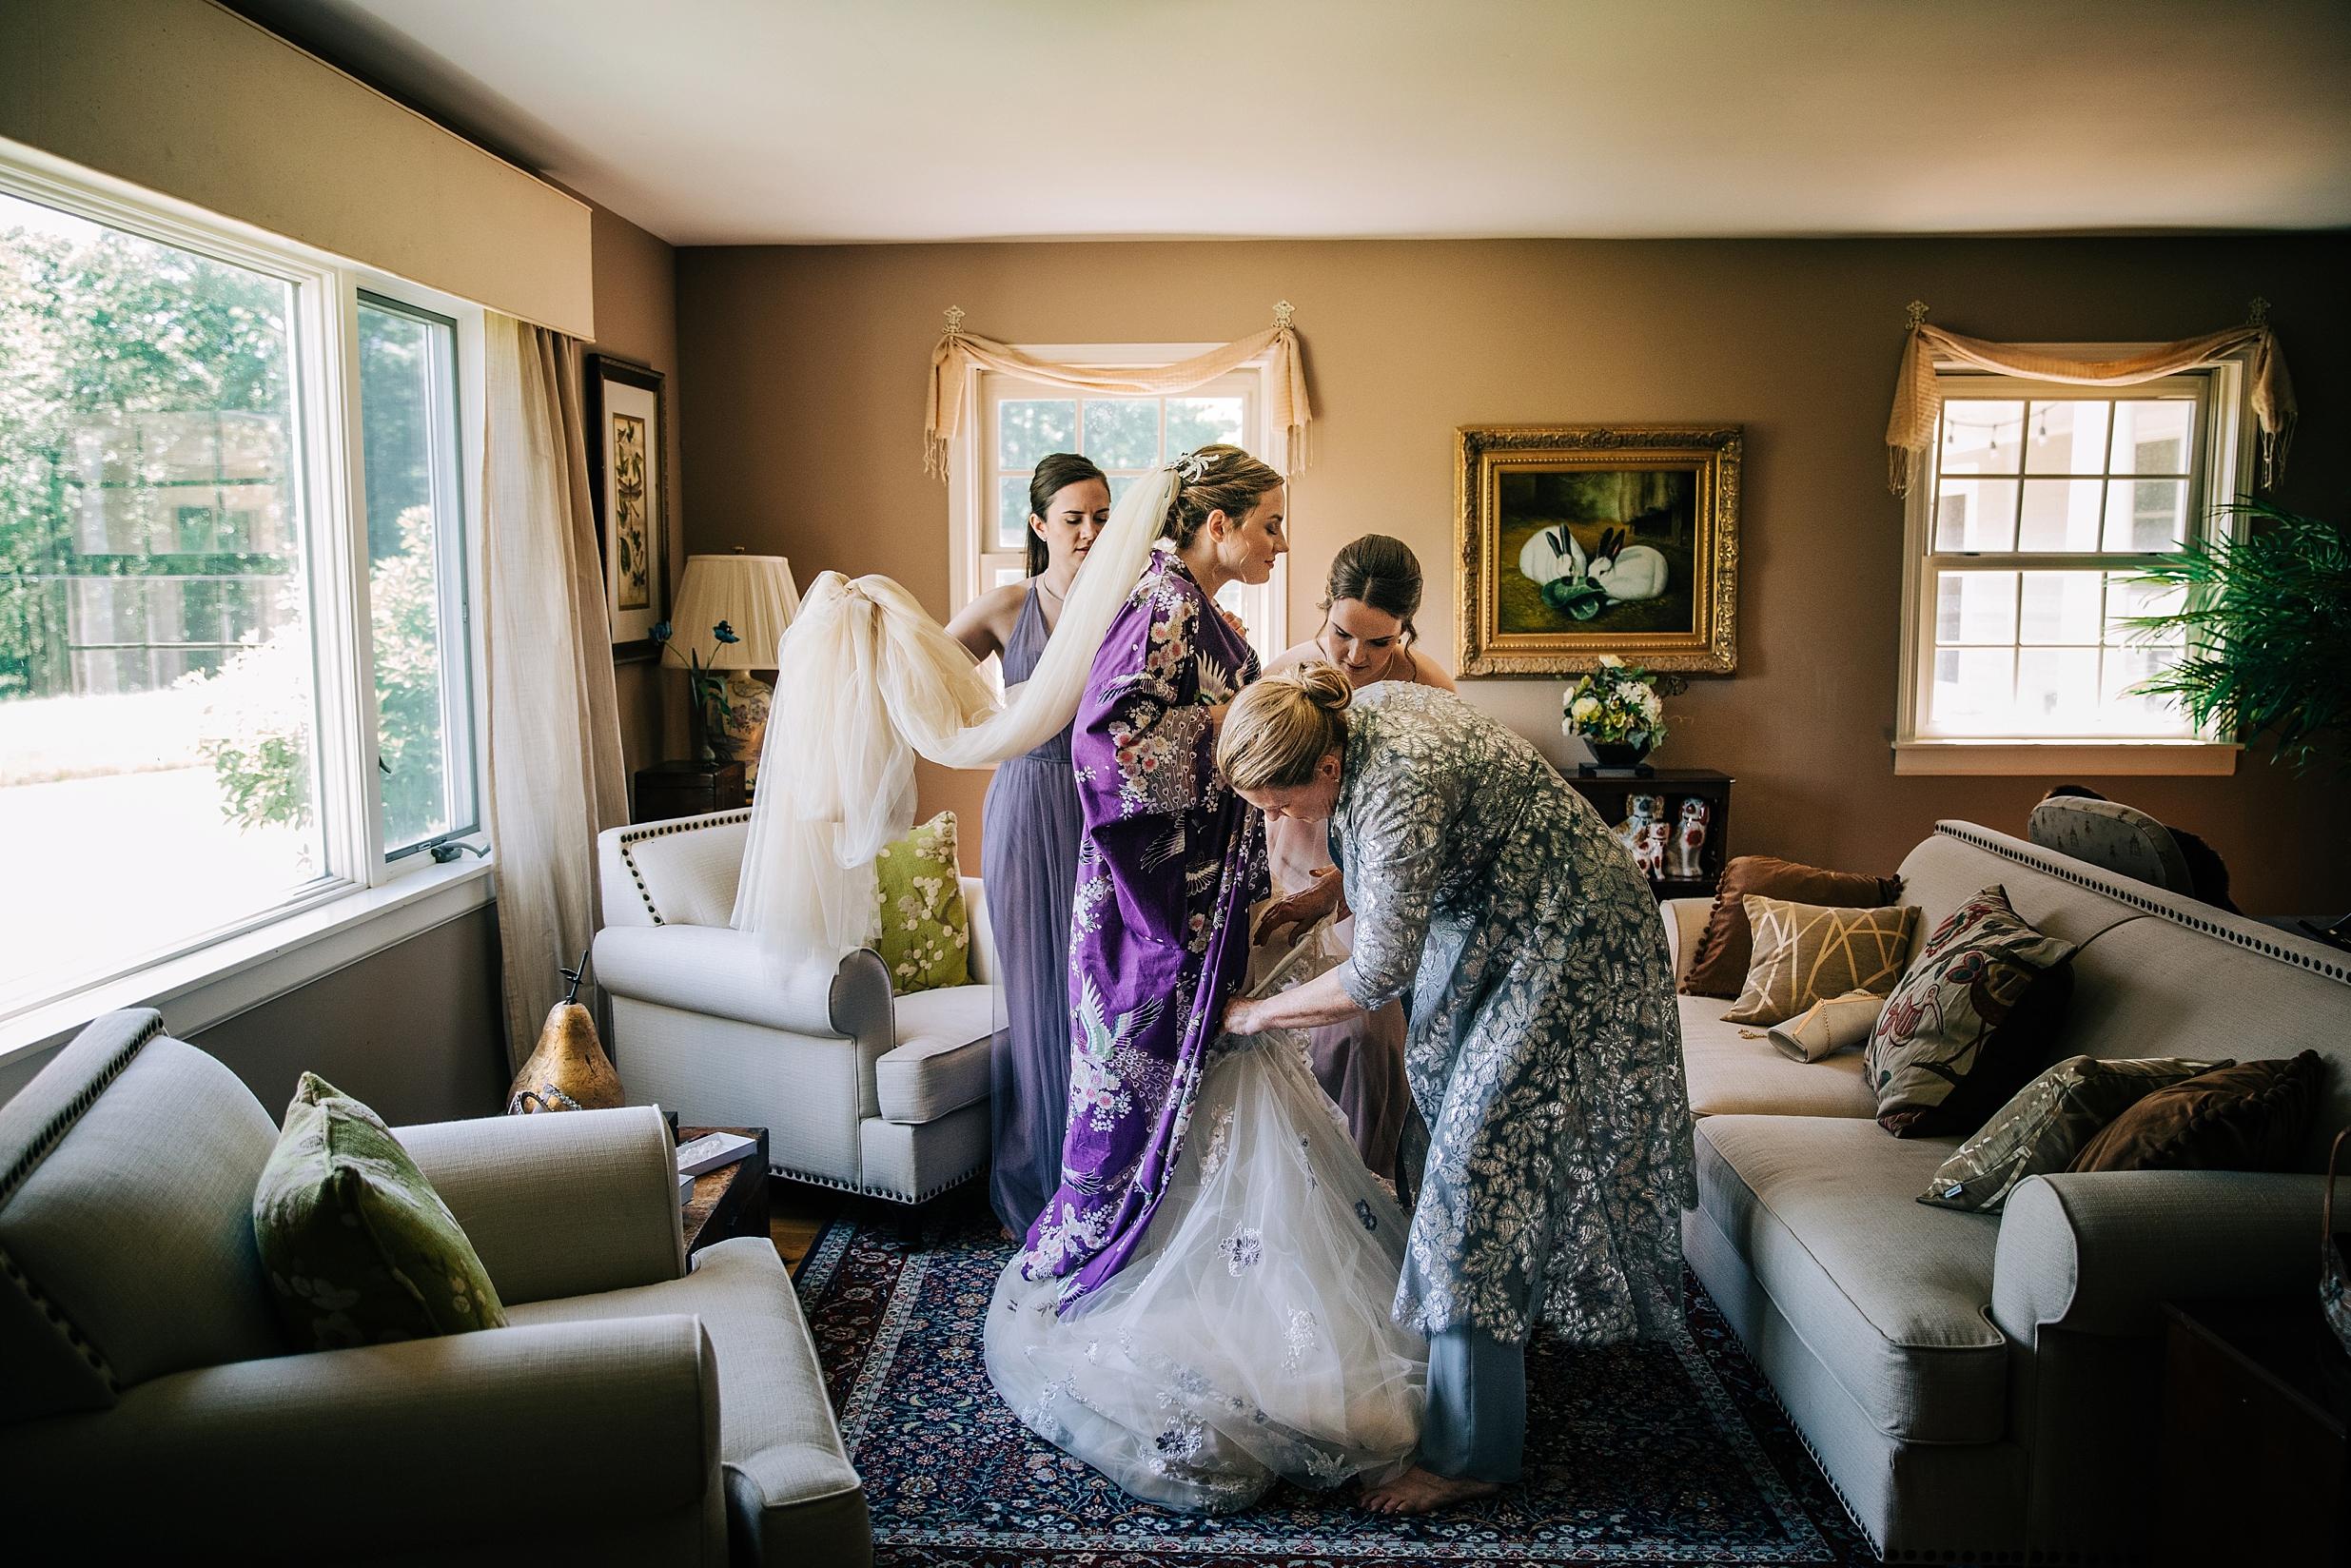 historic-upstate-ny-wedding-church-backyard-photographer_0005.jpg